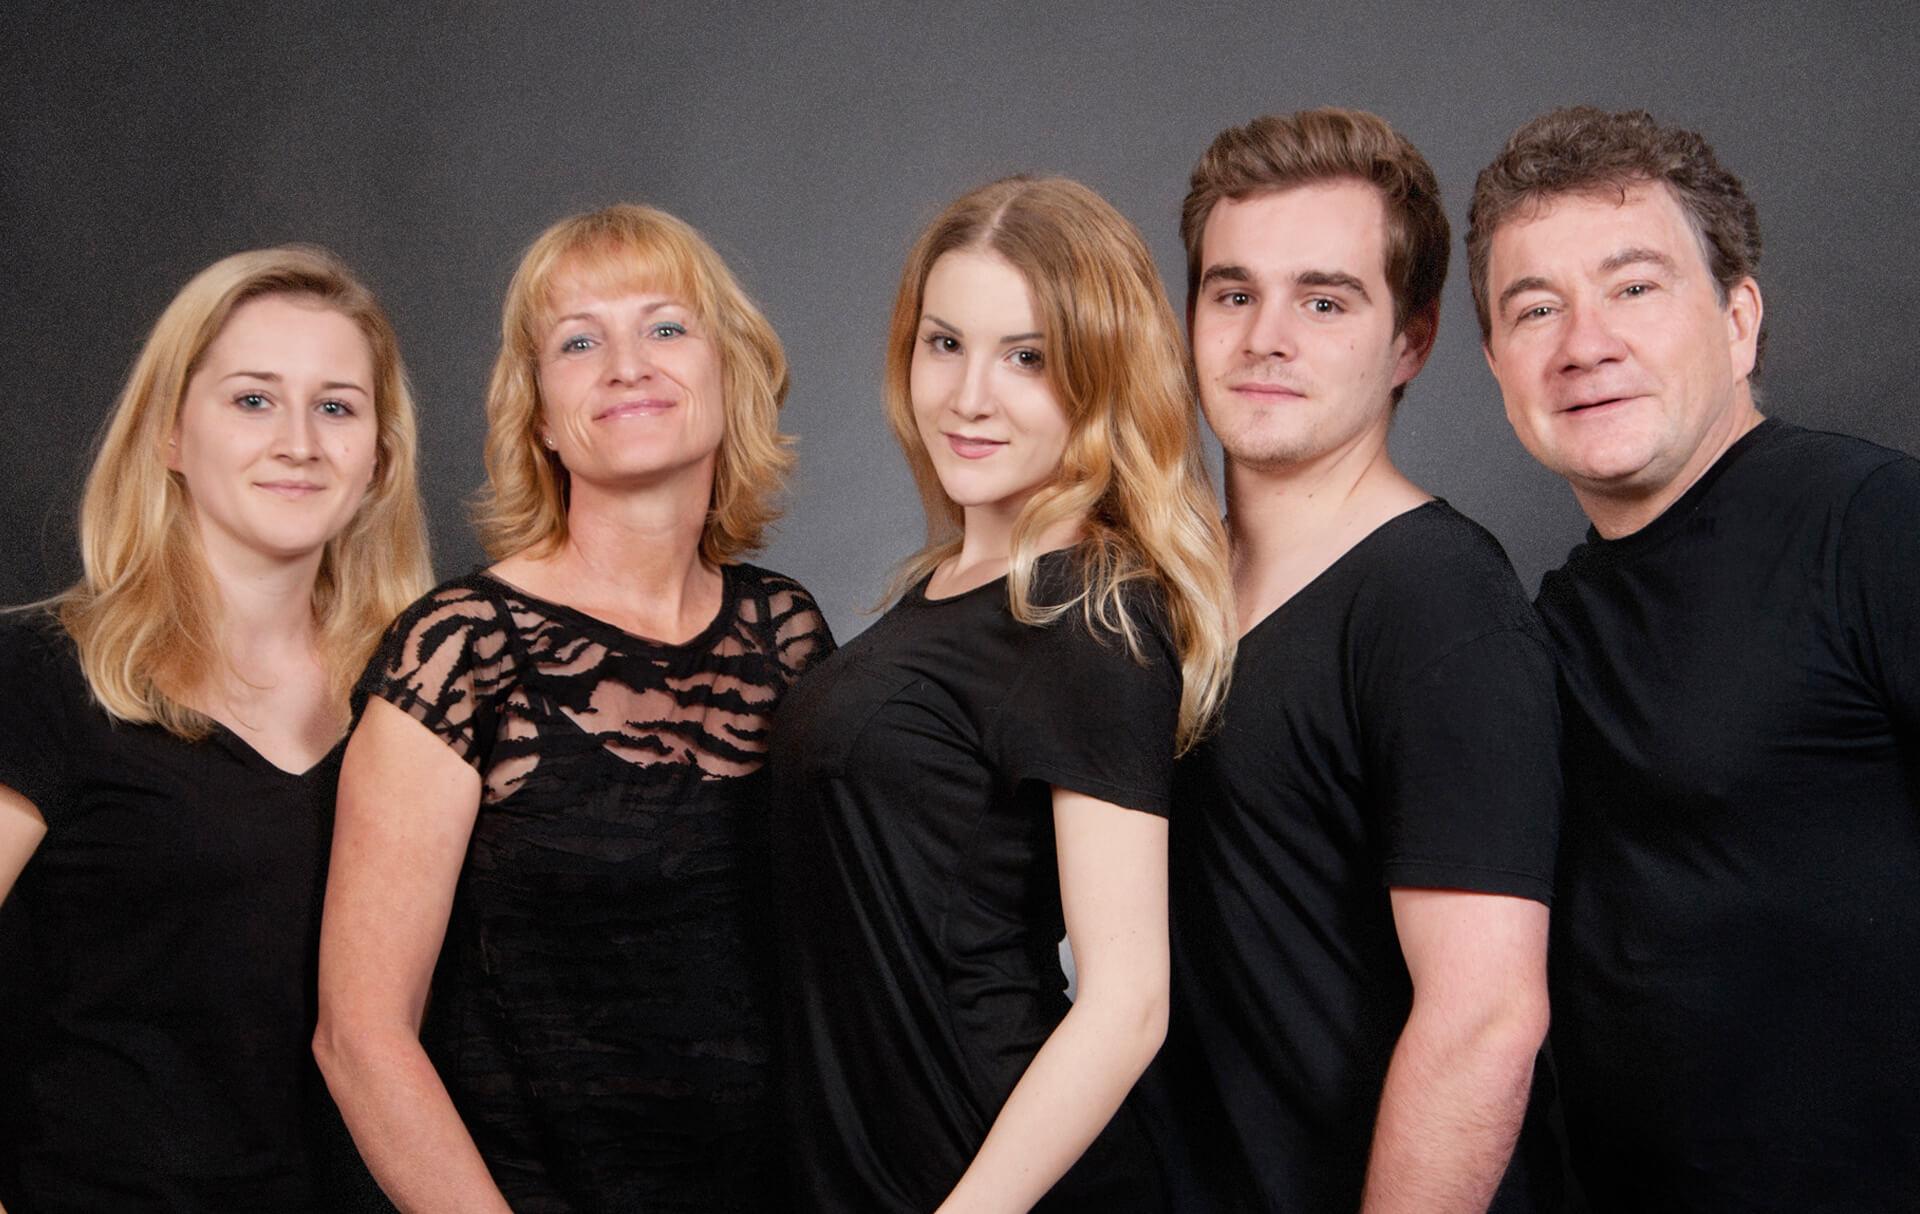 familienfotografie_fotostudio Familie mit 3 Kinder